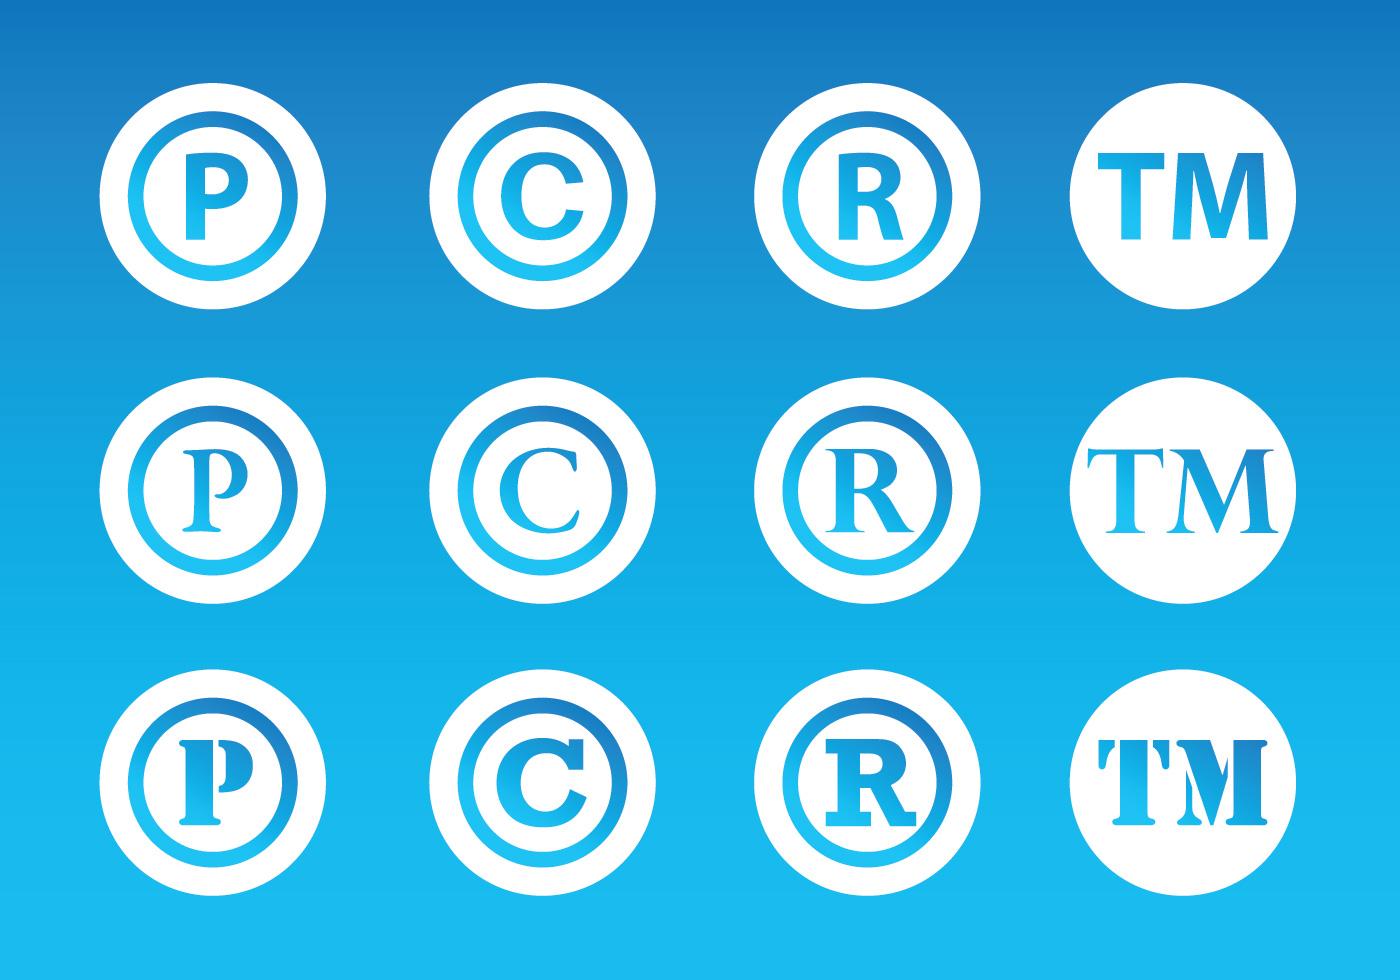 Copyright symbol free vector art 29741 free downloads biocorpaavc